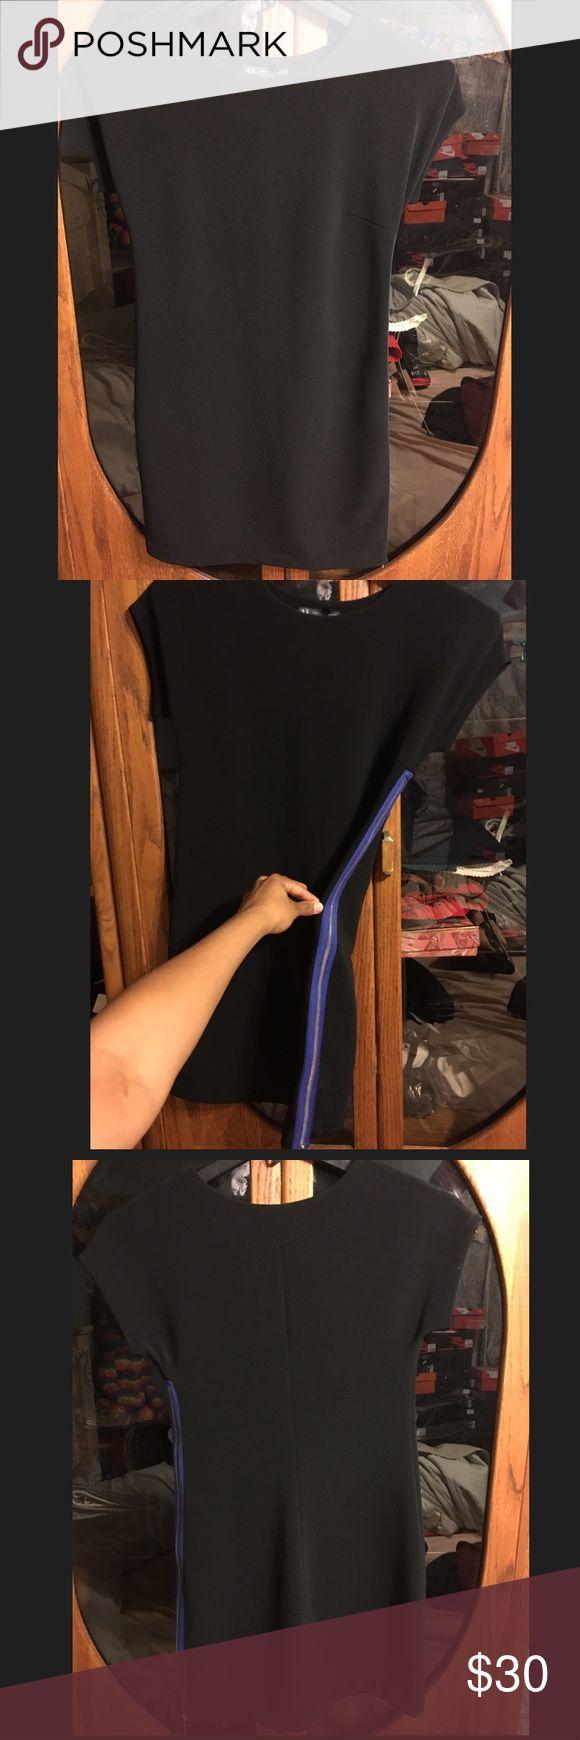 Selling this Brand New Women Armani Exchange Black Dress Size 2 on Poshmark! My username is: kakoukat2. #shopmycloset #poshmark #fashion #shopping #style #forsale #Armani Exchange #Dresses & Skirts